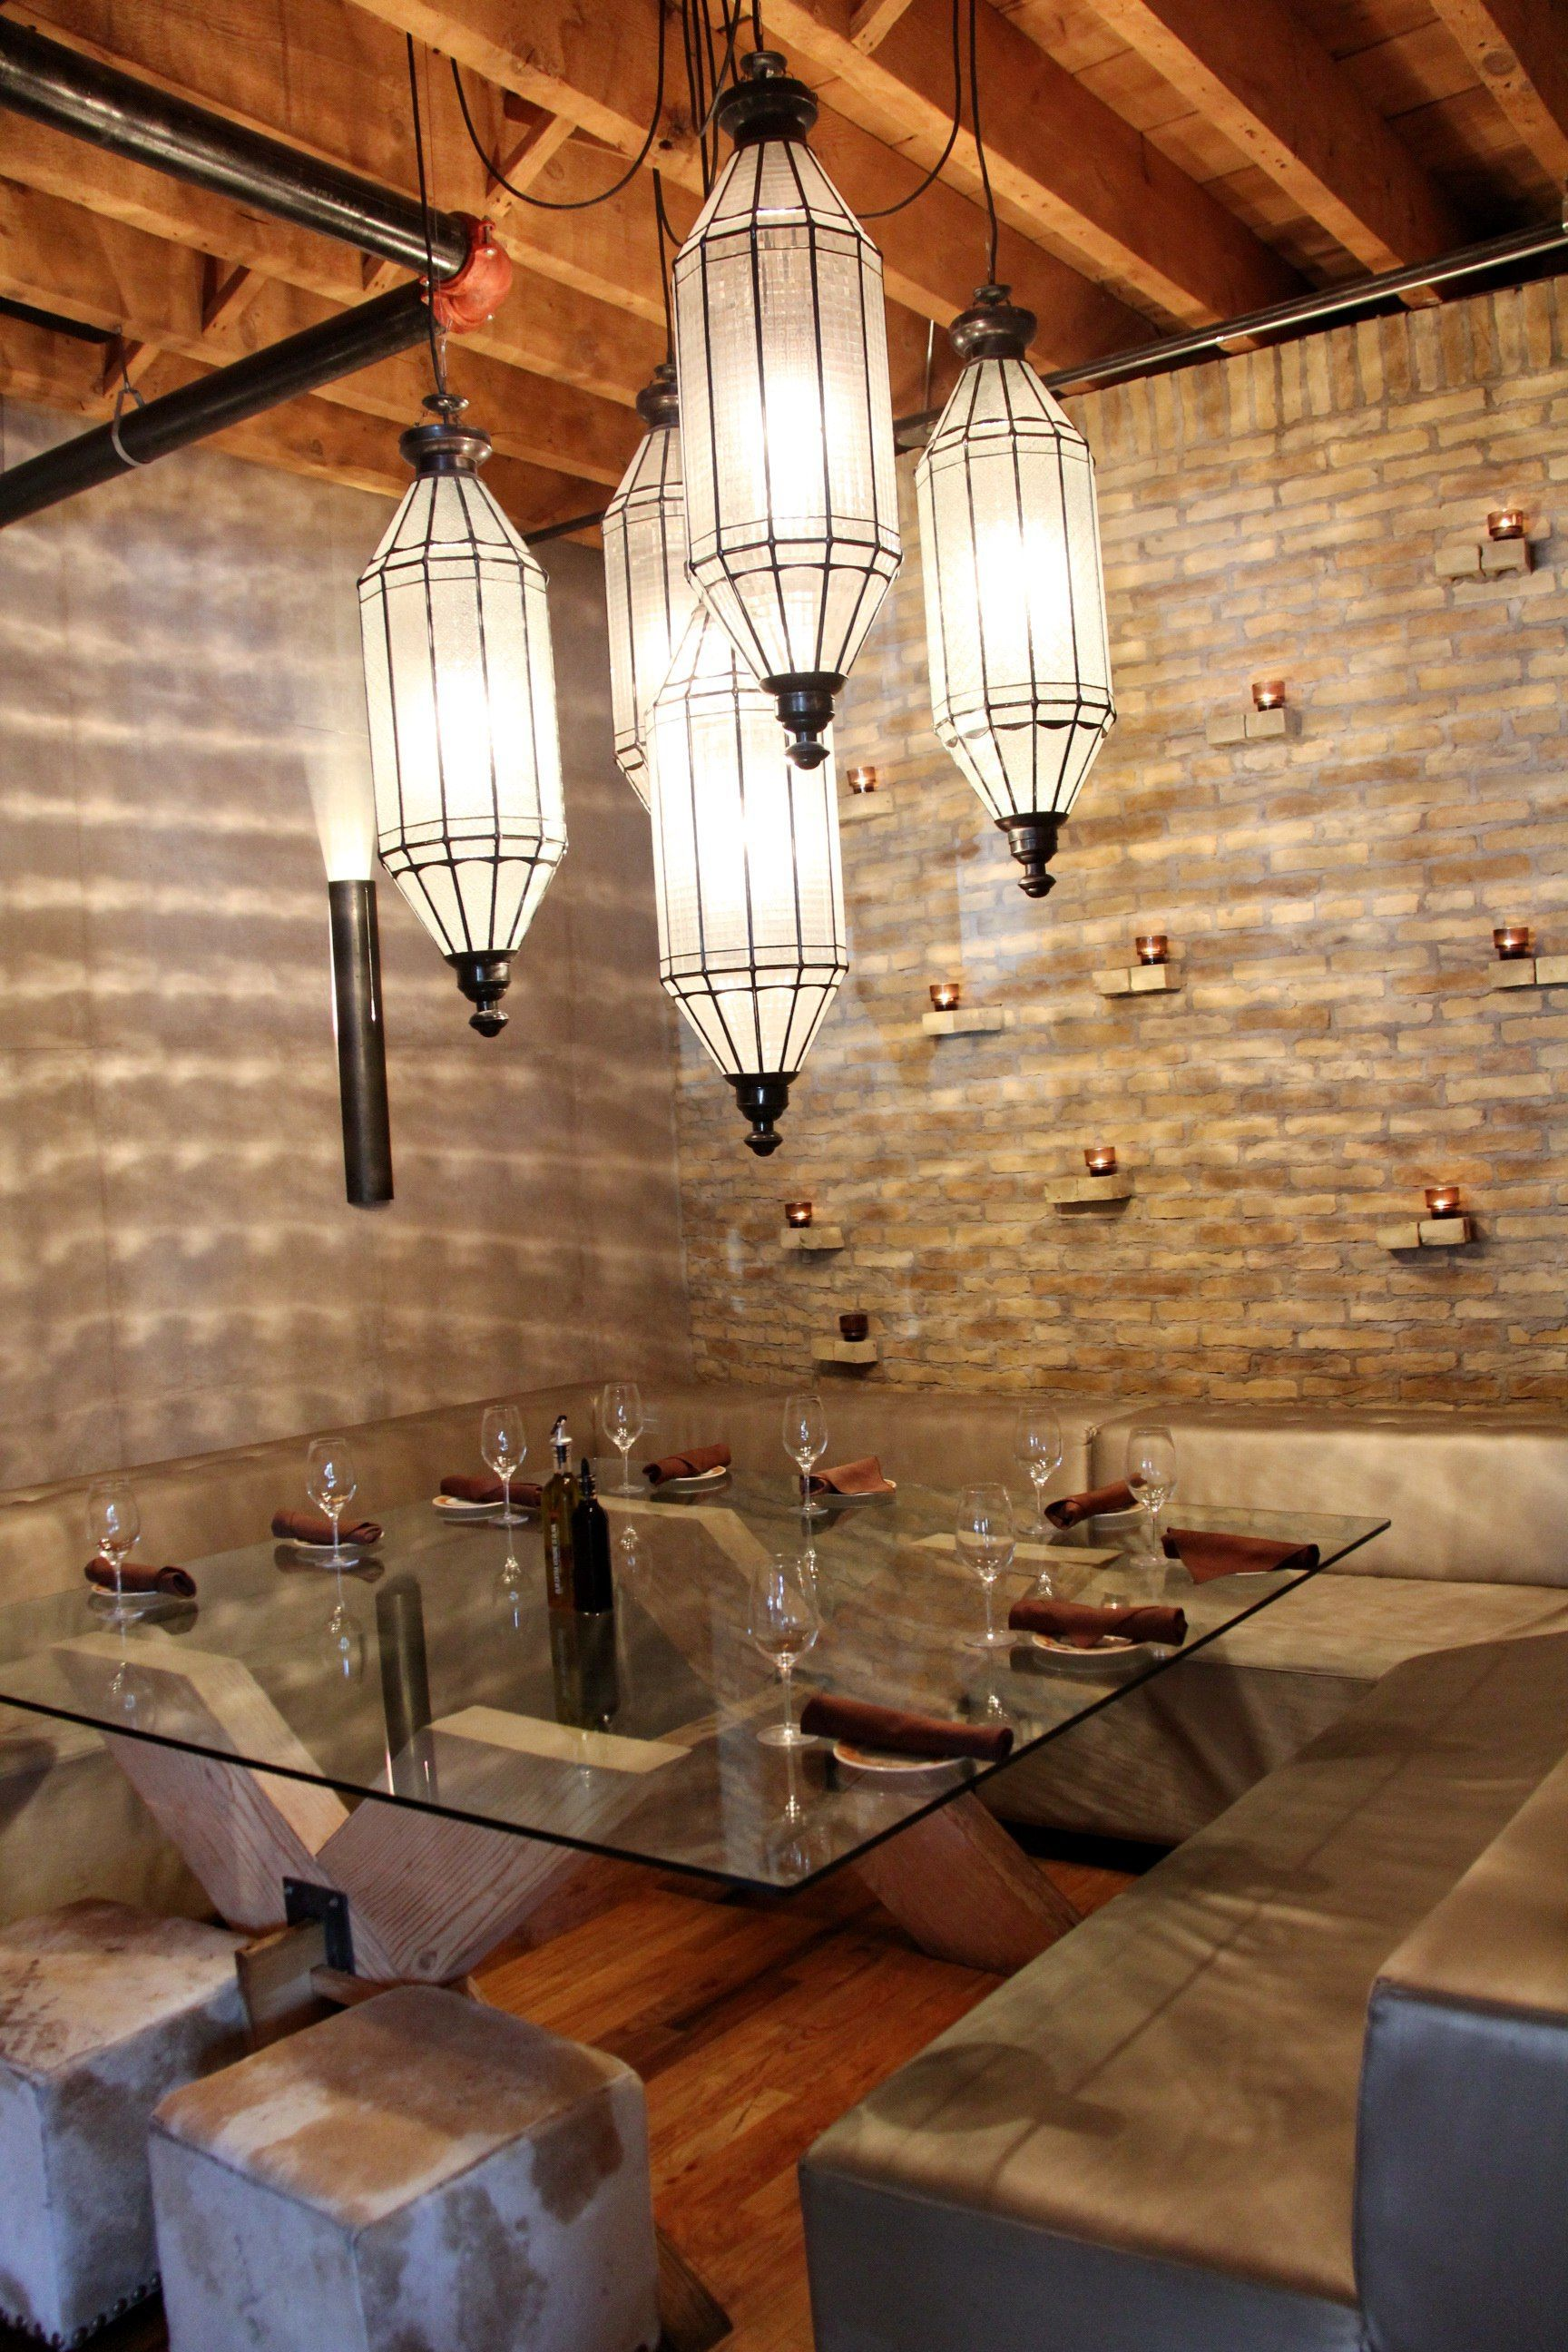 Modern industrial chic interiors at cibo wine bar 2472 yonge st toronto